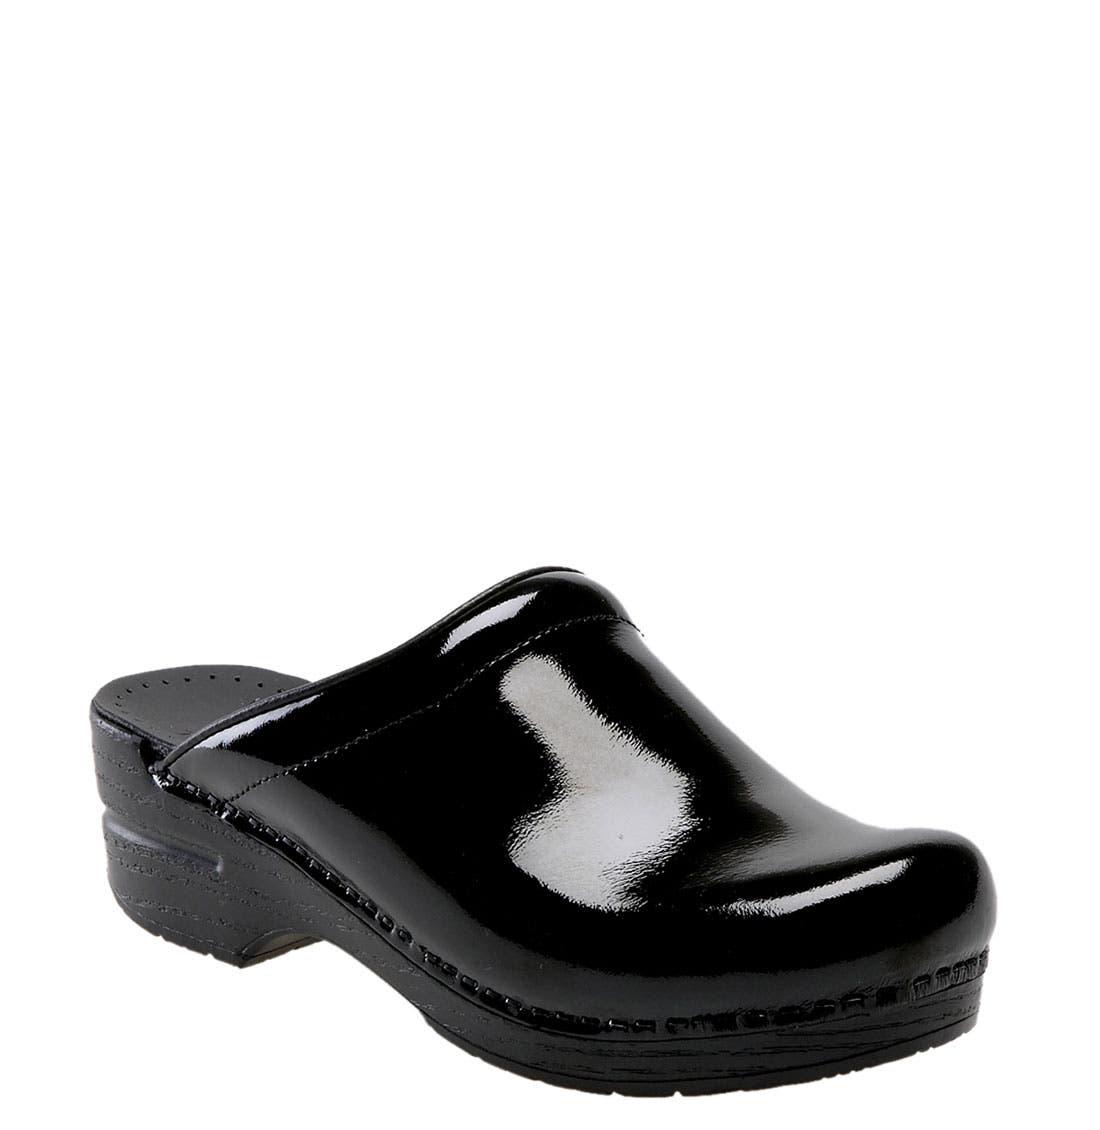 'Sonja' Patent Leather Clog,                         Main,                         color, BLACK PATENT